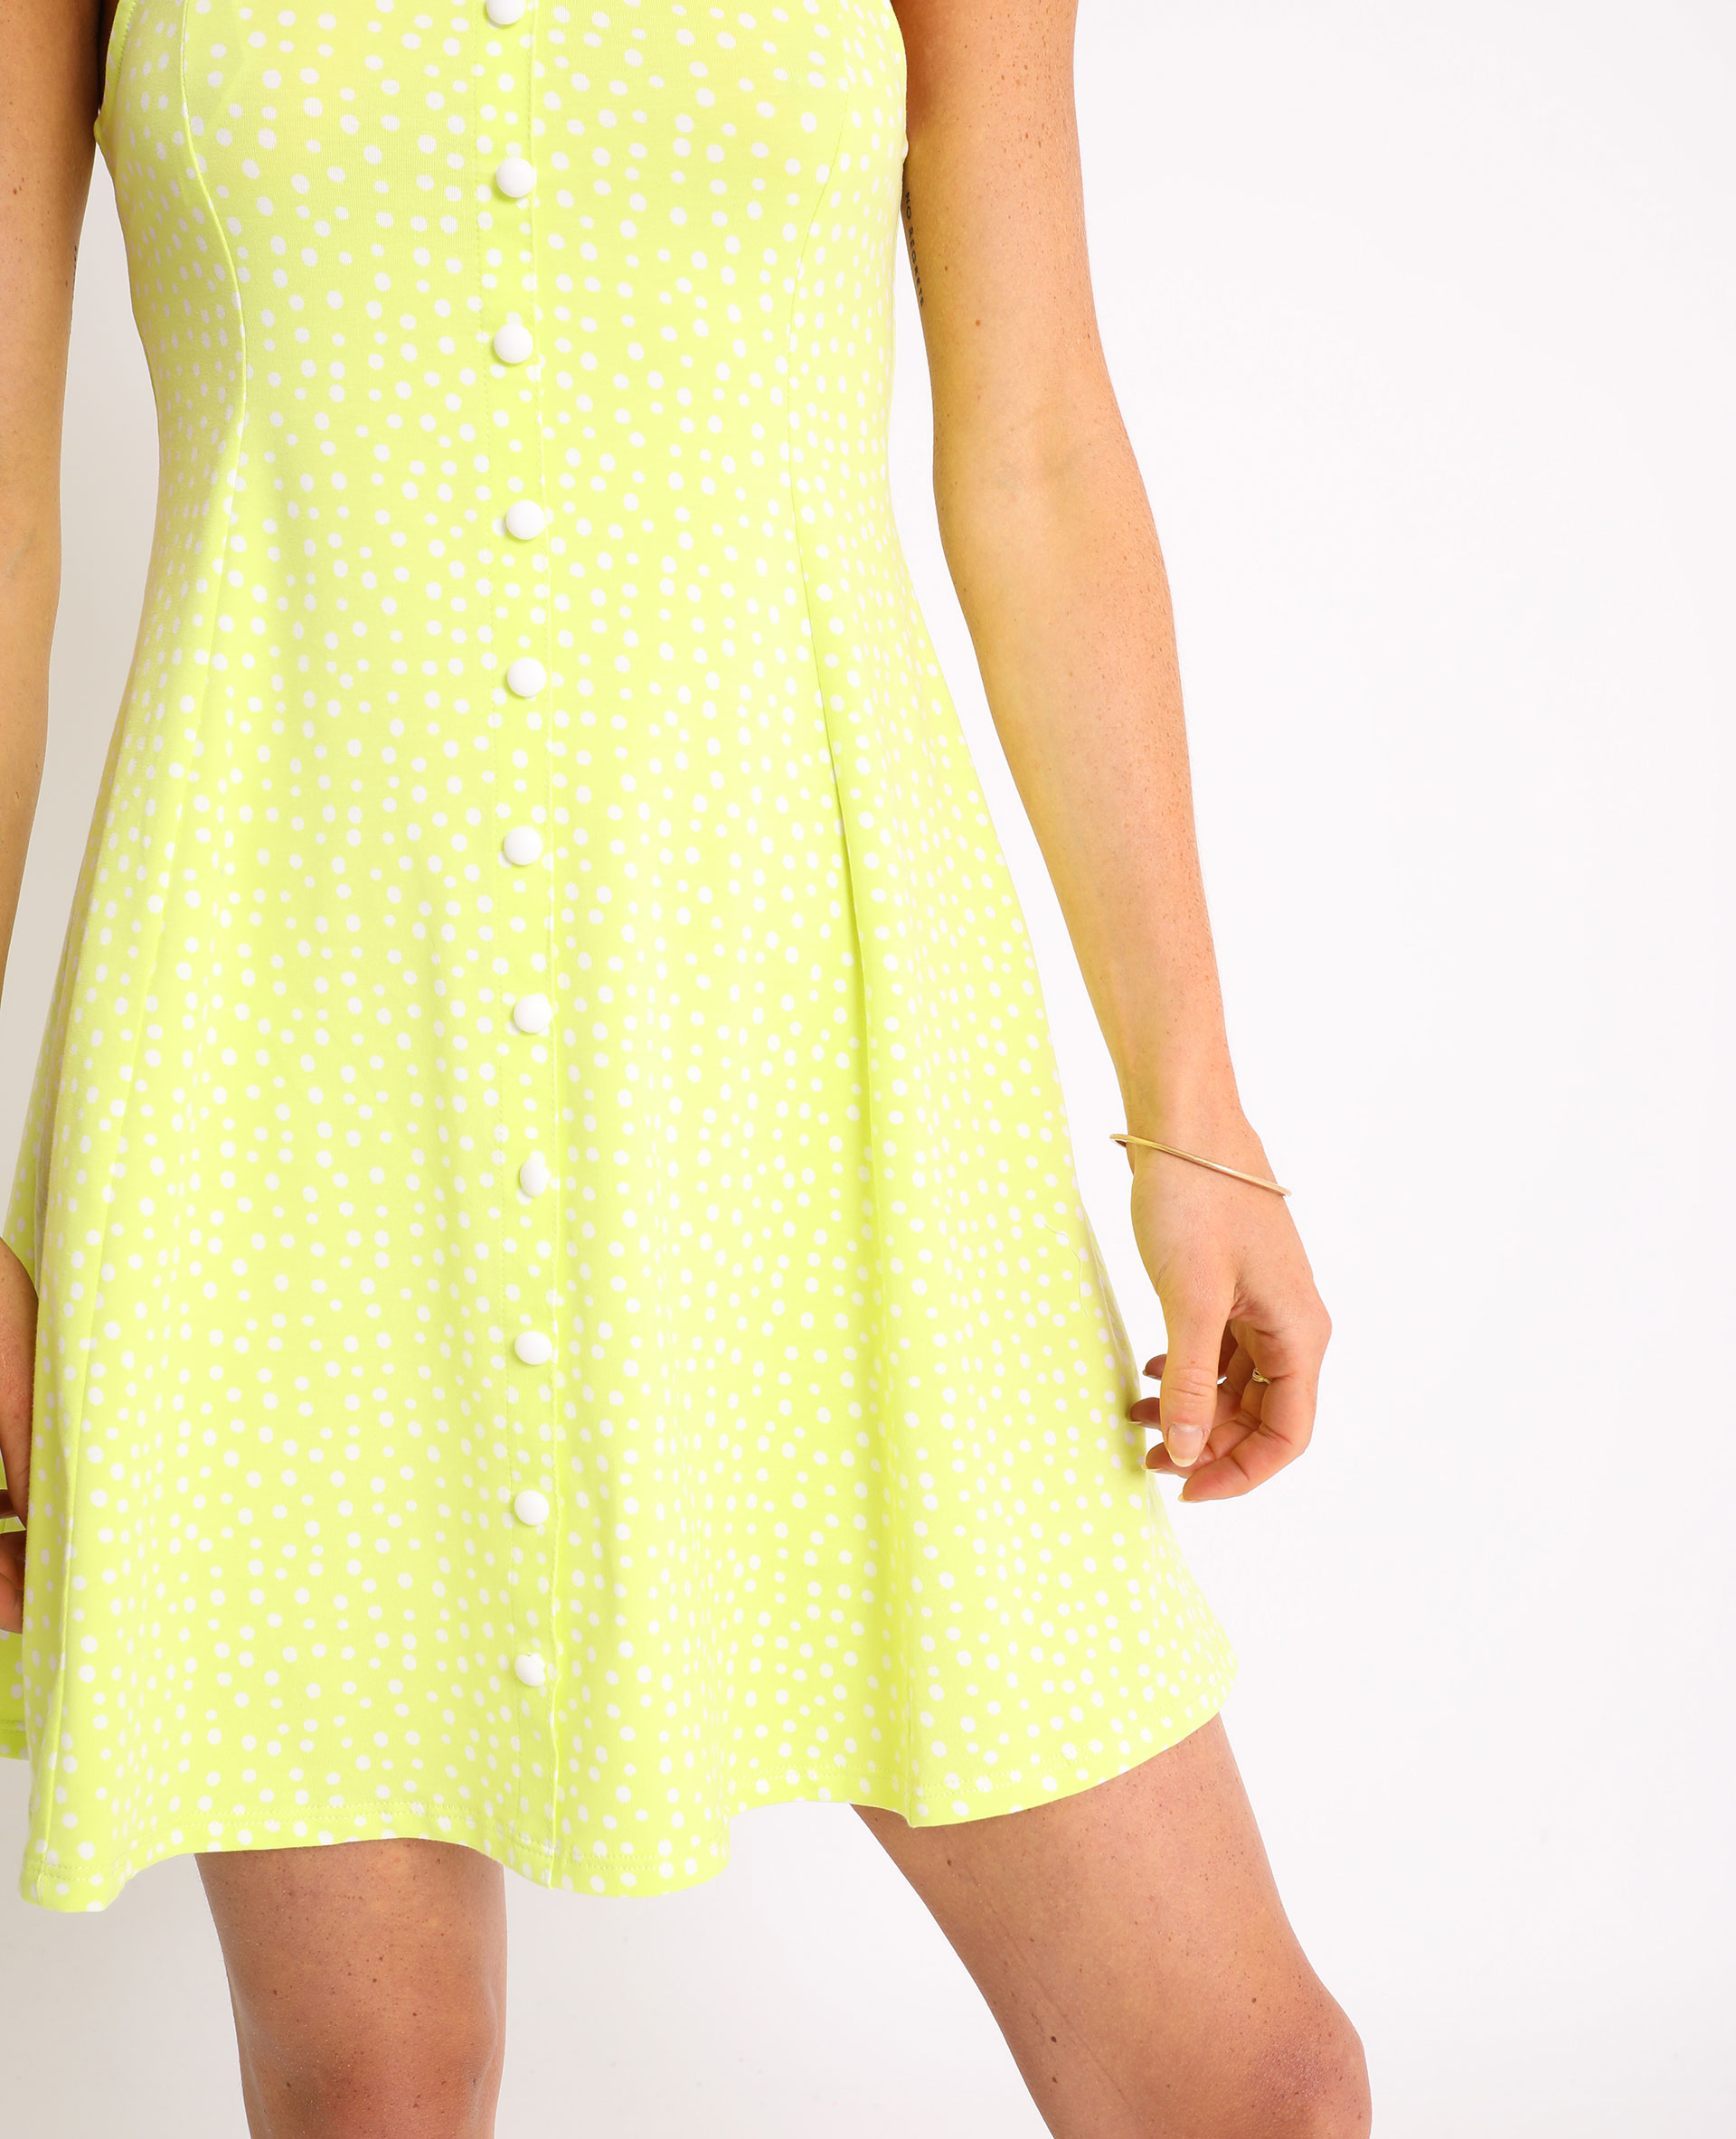 Petite robe à pois jaune fluo - Pimkie